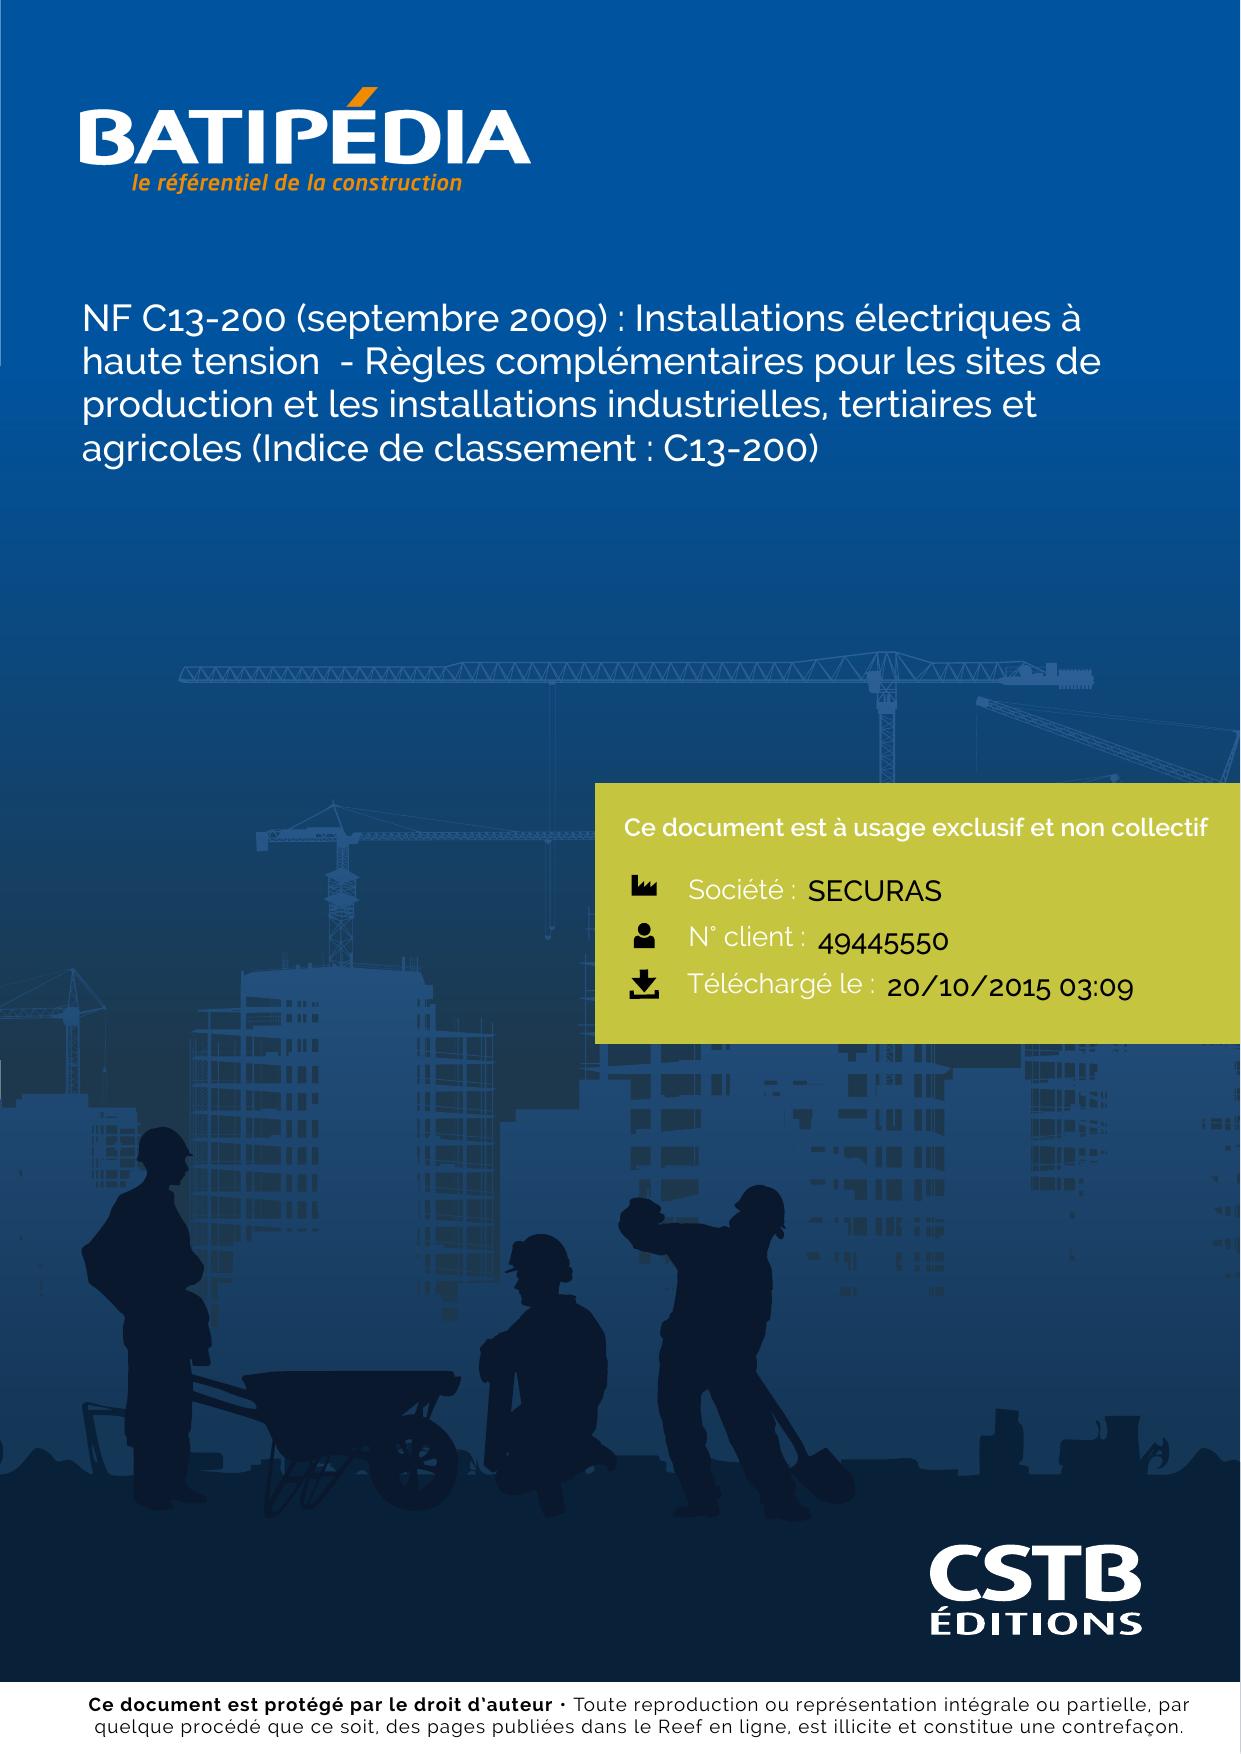 NFC 13-200 TÉLÉCHARGER